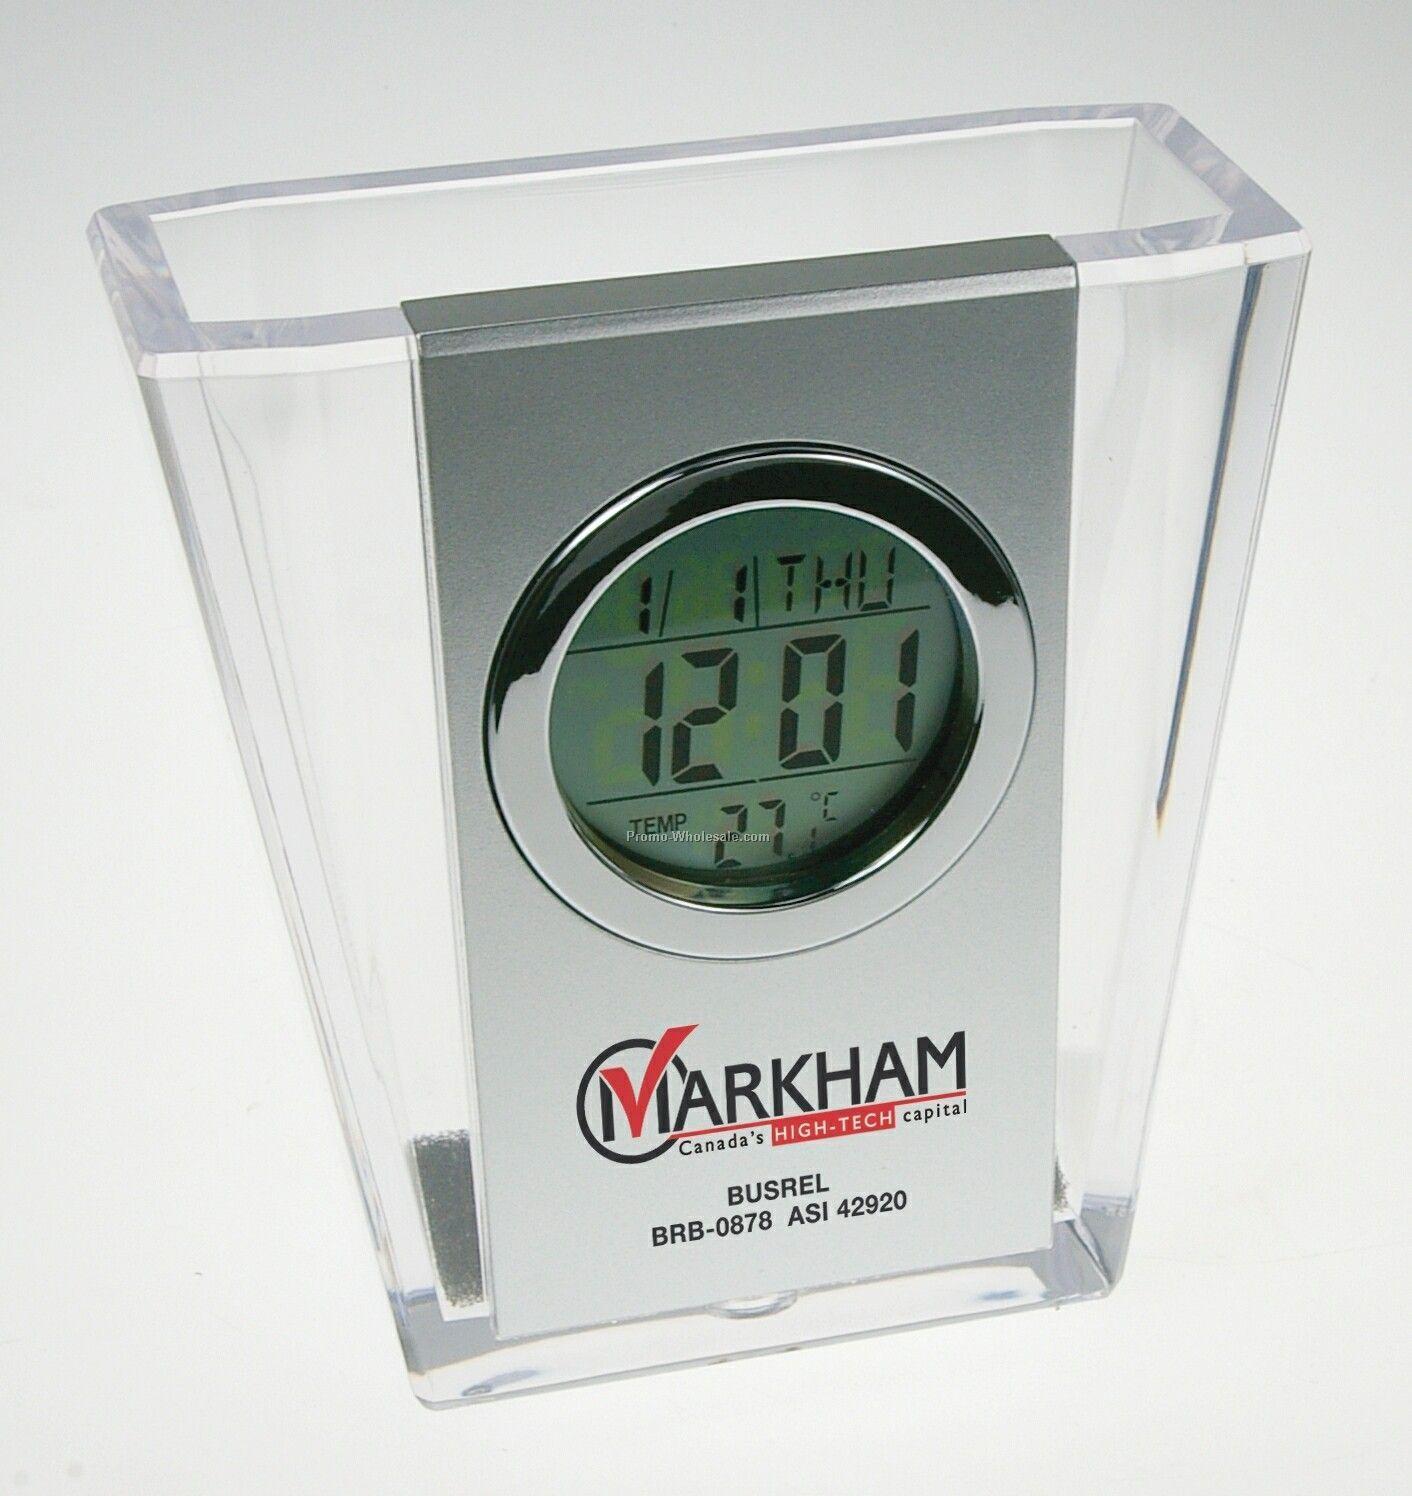 Transparent Acrylic Pen Holder W/ Clock, Calendar & Thermometer